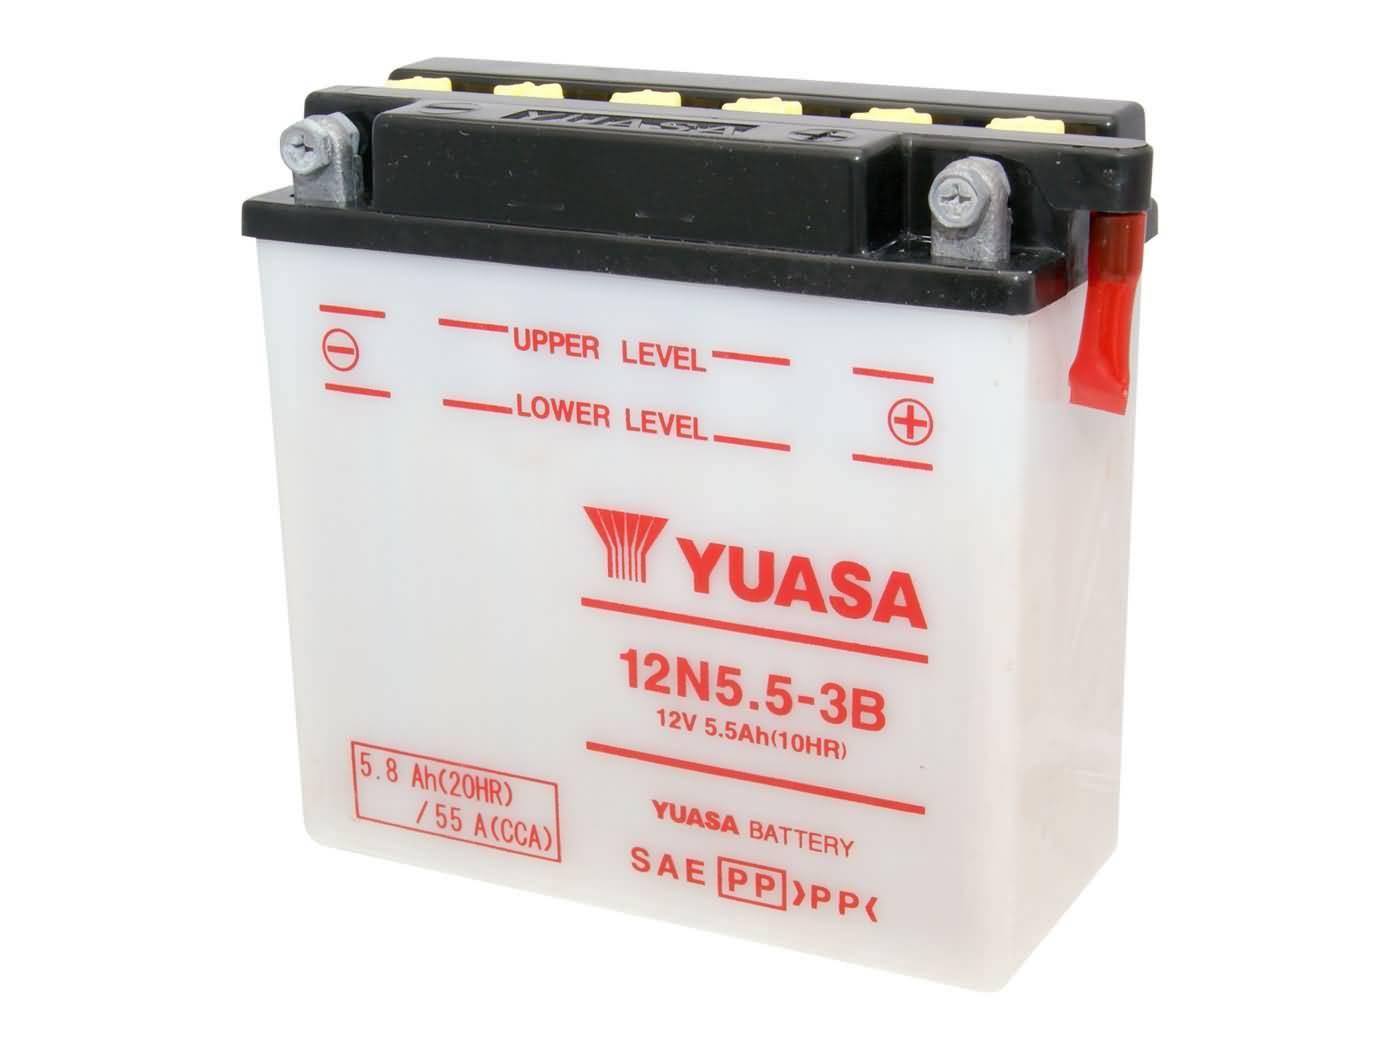 Yuasa 12N5.5-3B akkumulátor - savcsomag nélkül